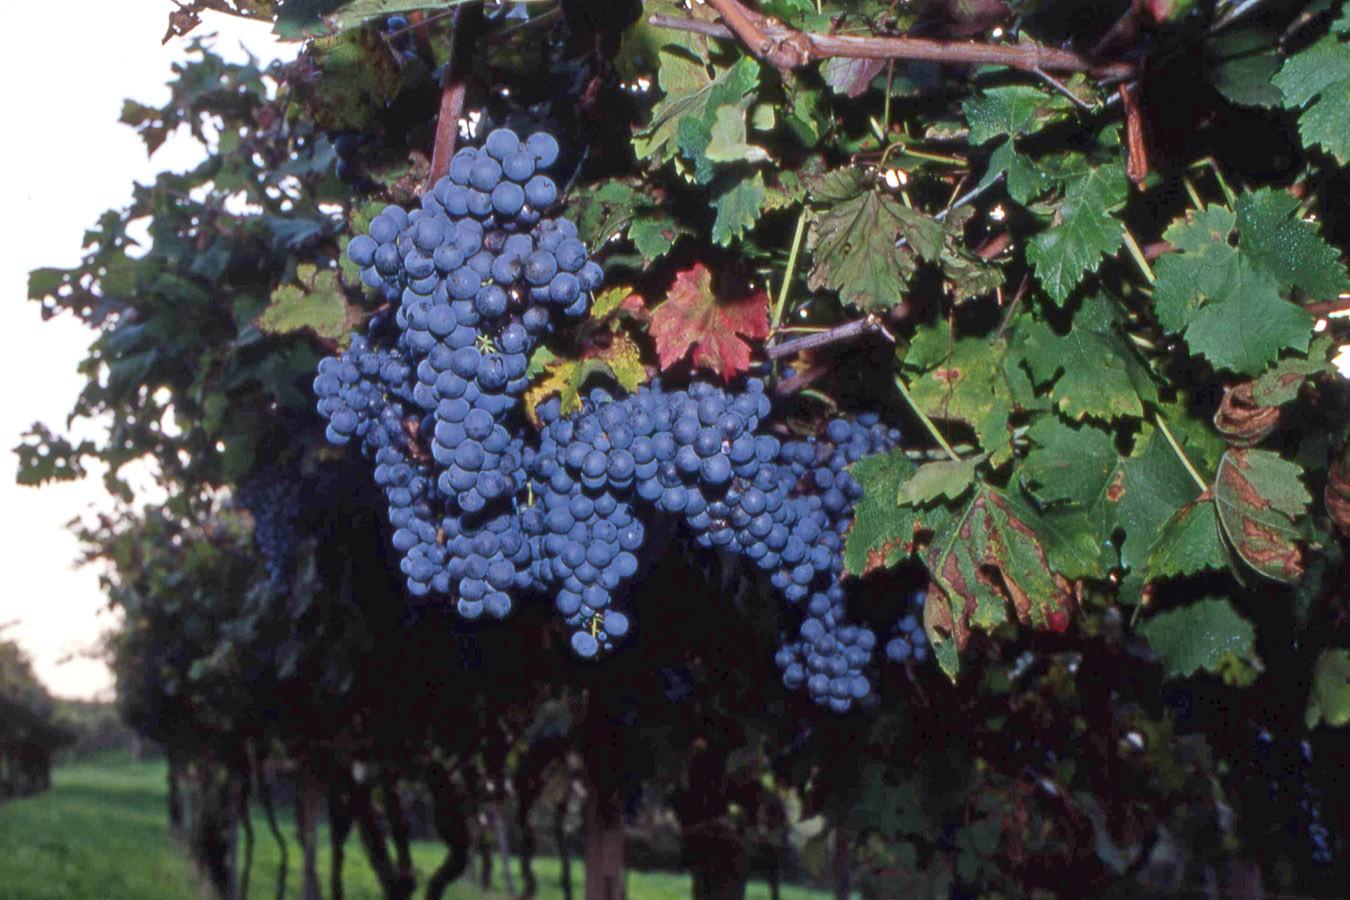 Azienda Vinicola Platter Cavriana62